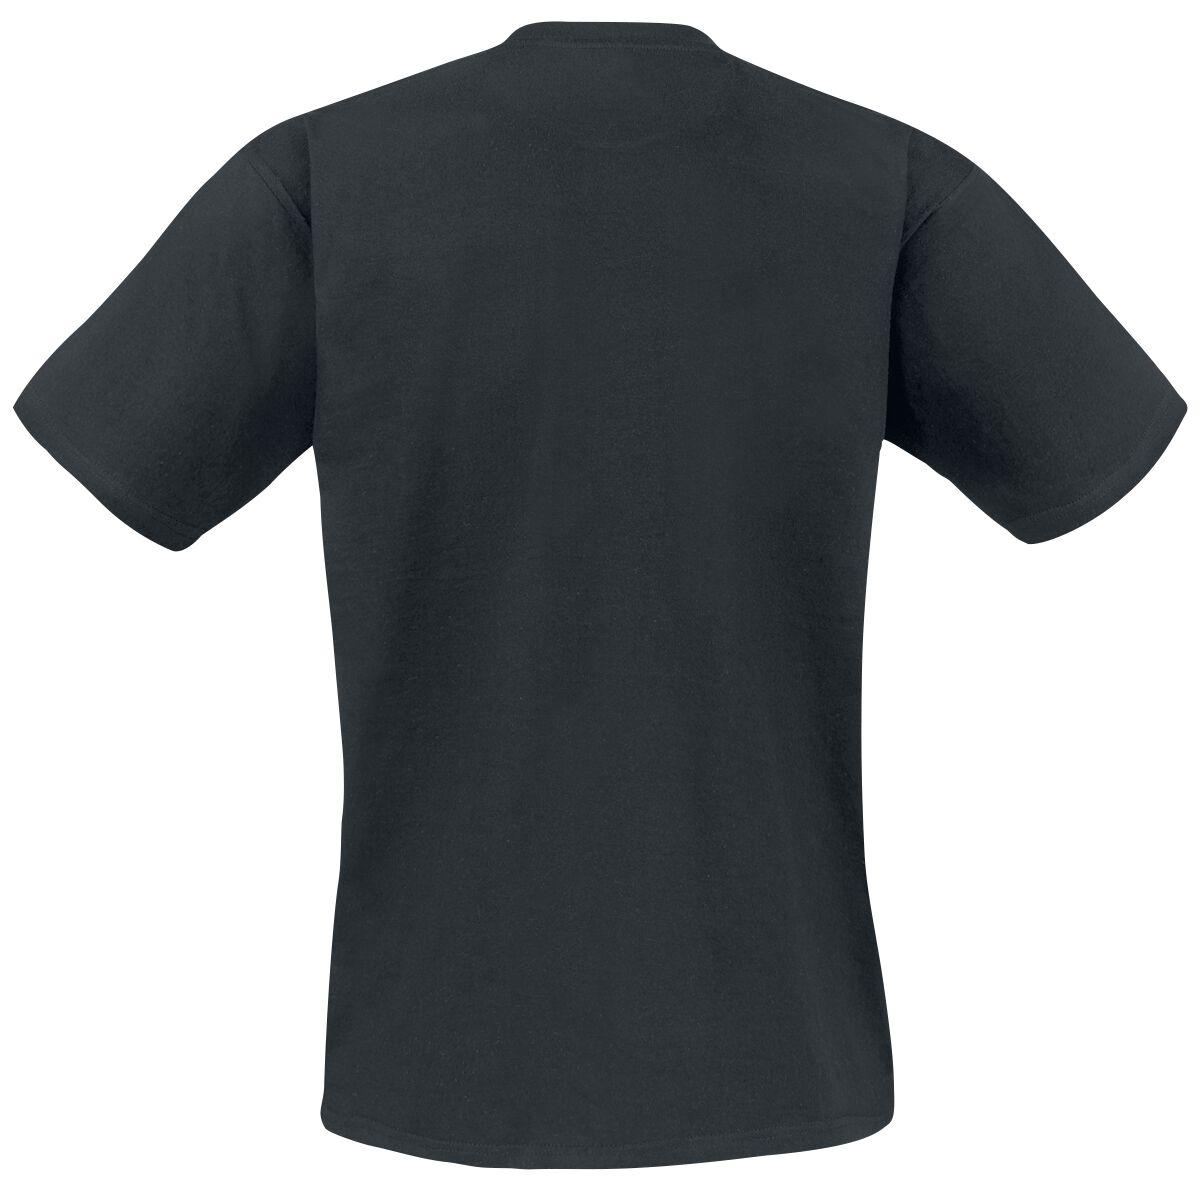 Anatomy Park | Rick And Morty T-Shirt | EMP